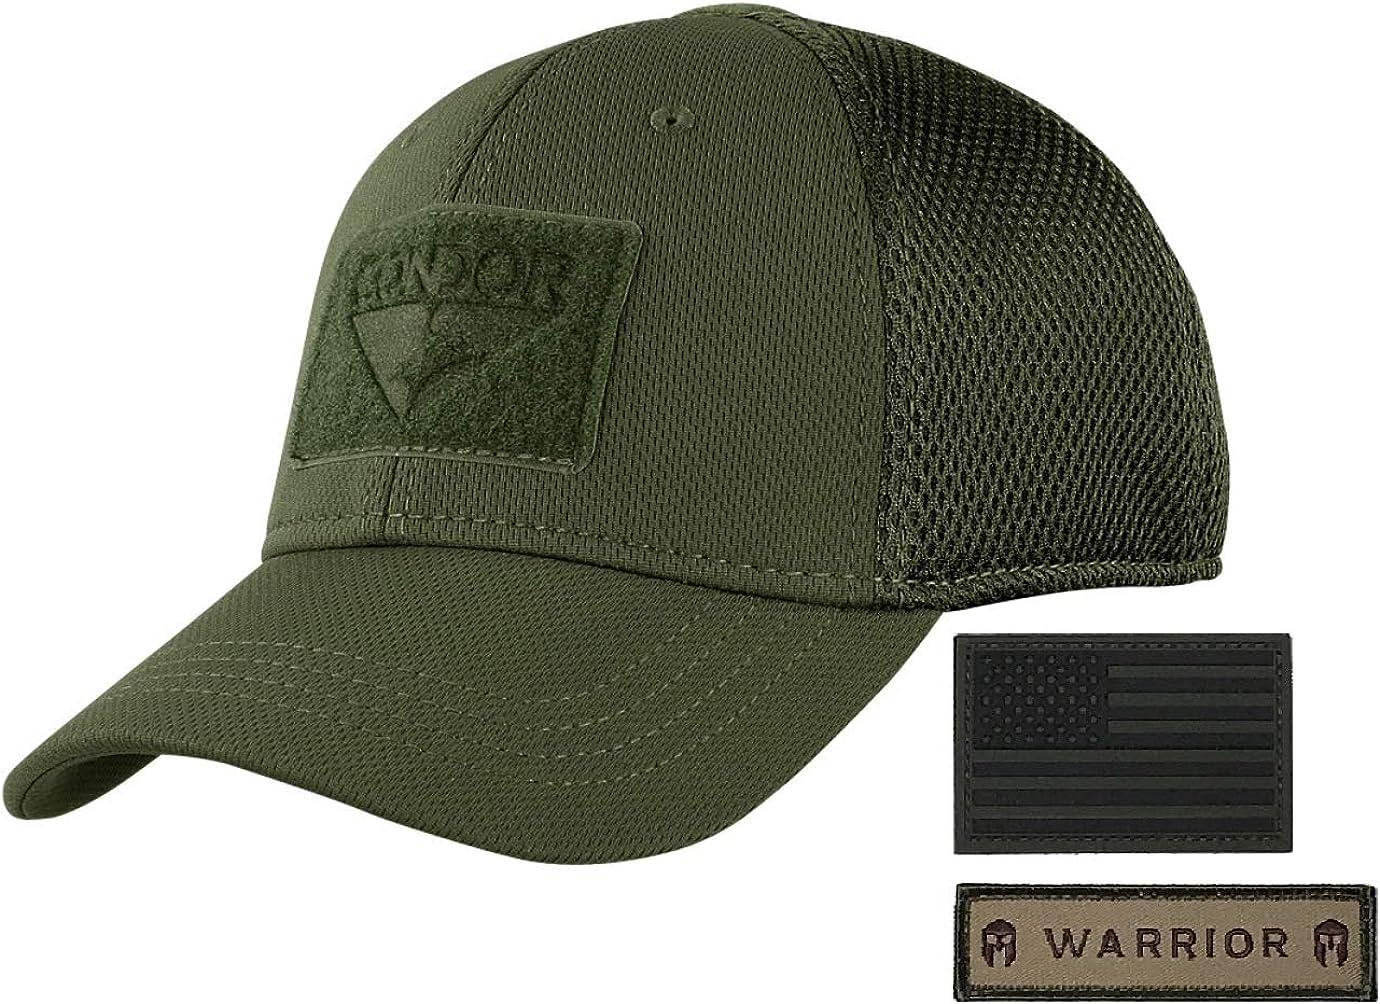 Condor Flex Mesh Cap OD Free shipping on posting reviews Green Wa Flag with Bundled Max 61% OFF Armorbilt